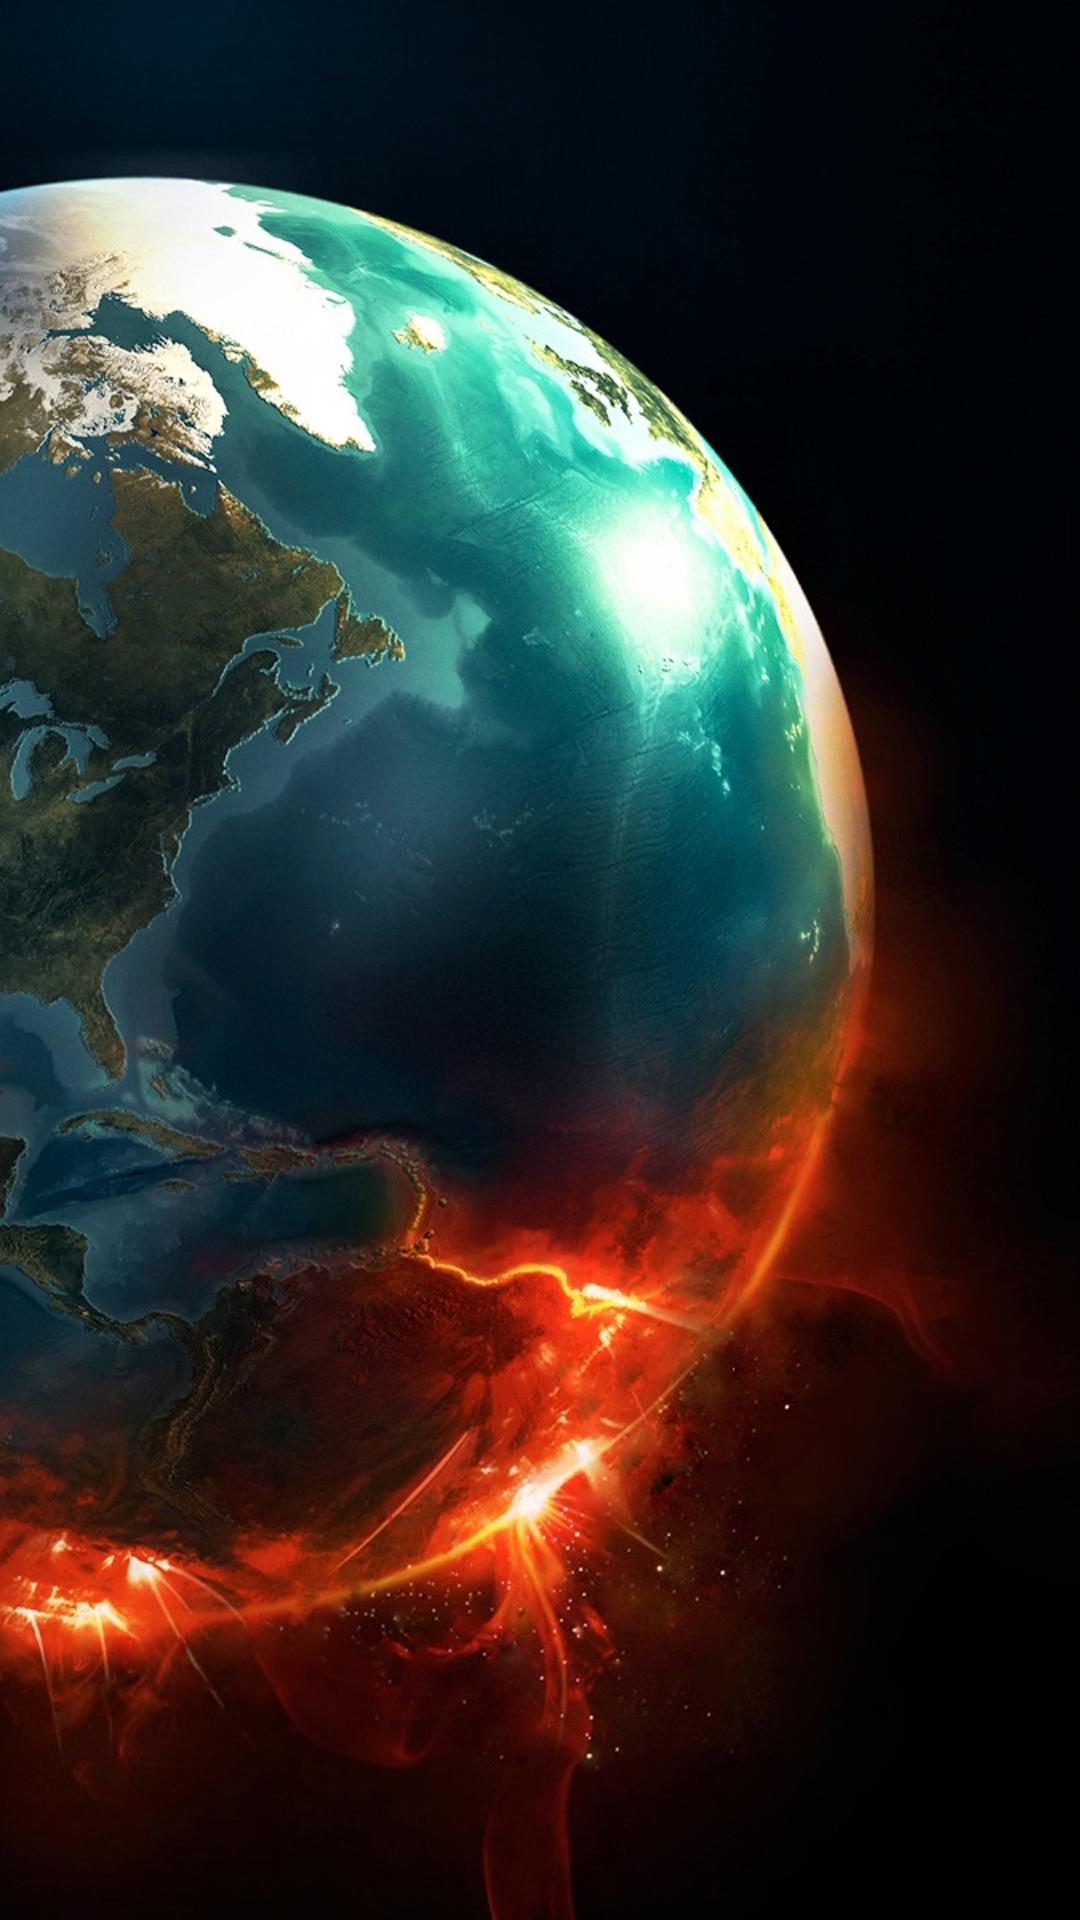 Supernova htc wallpaper